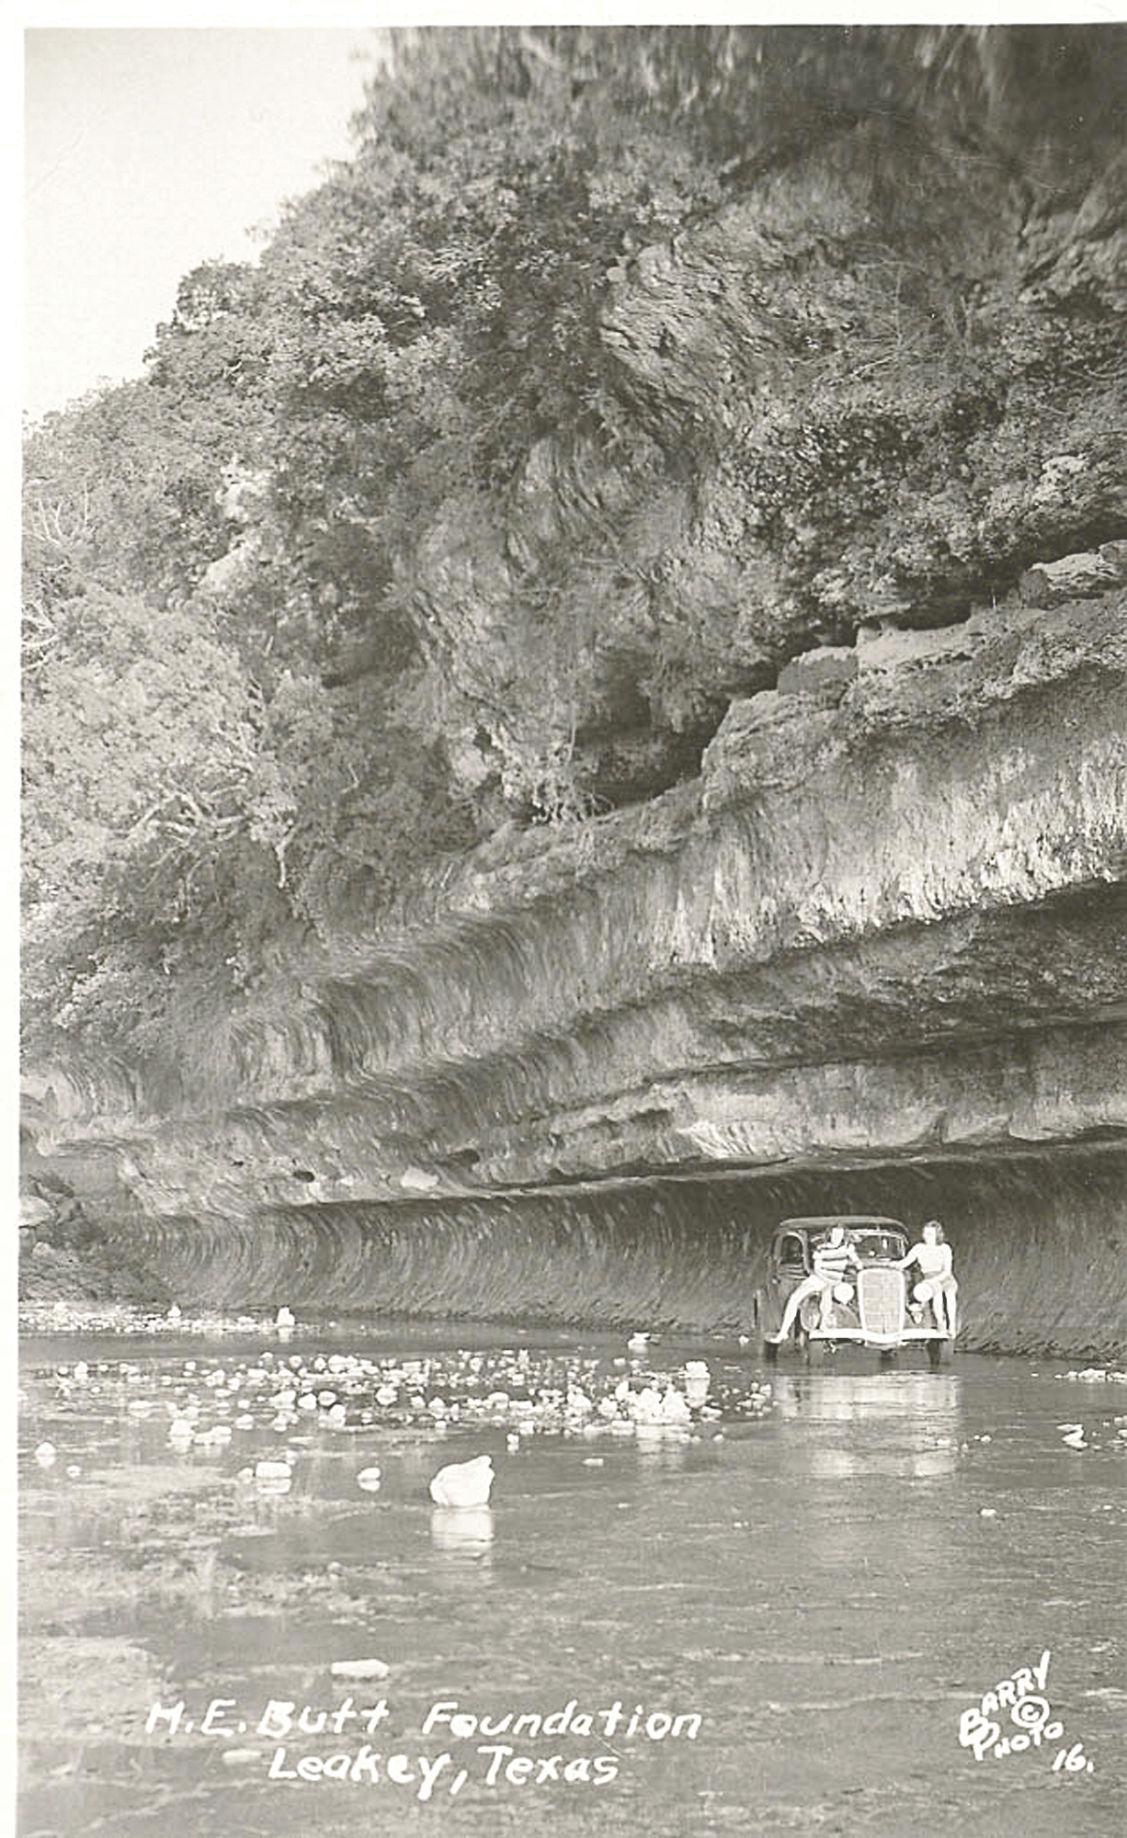 Undated Frio River photo